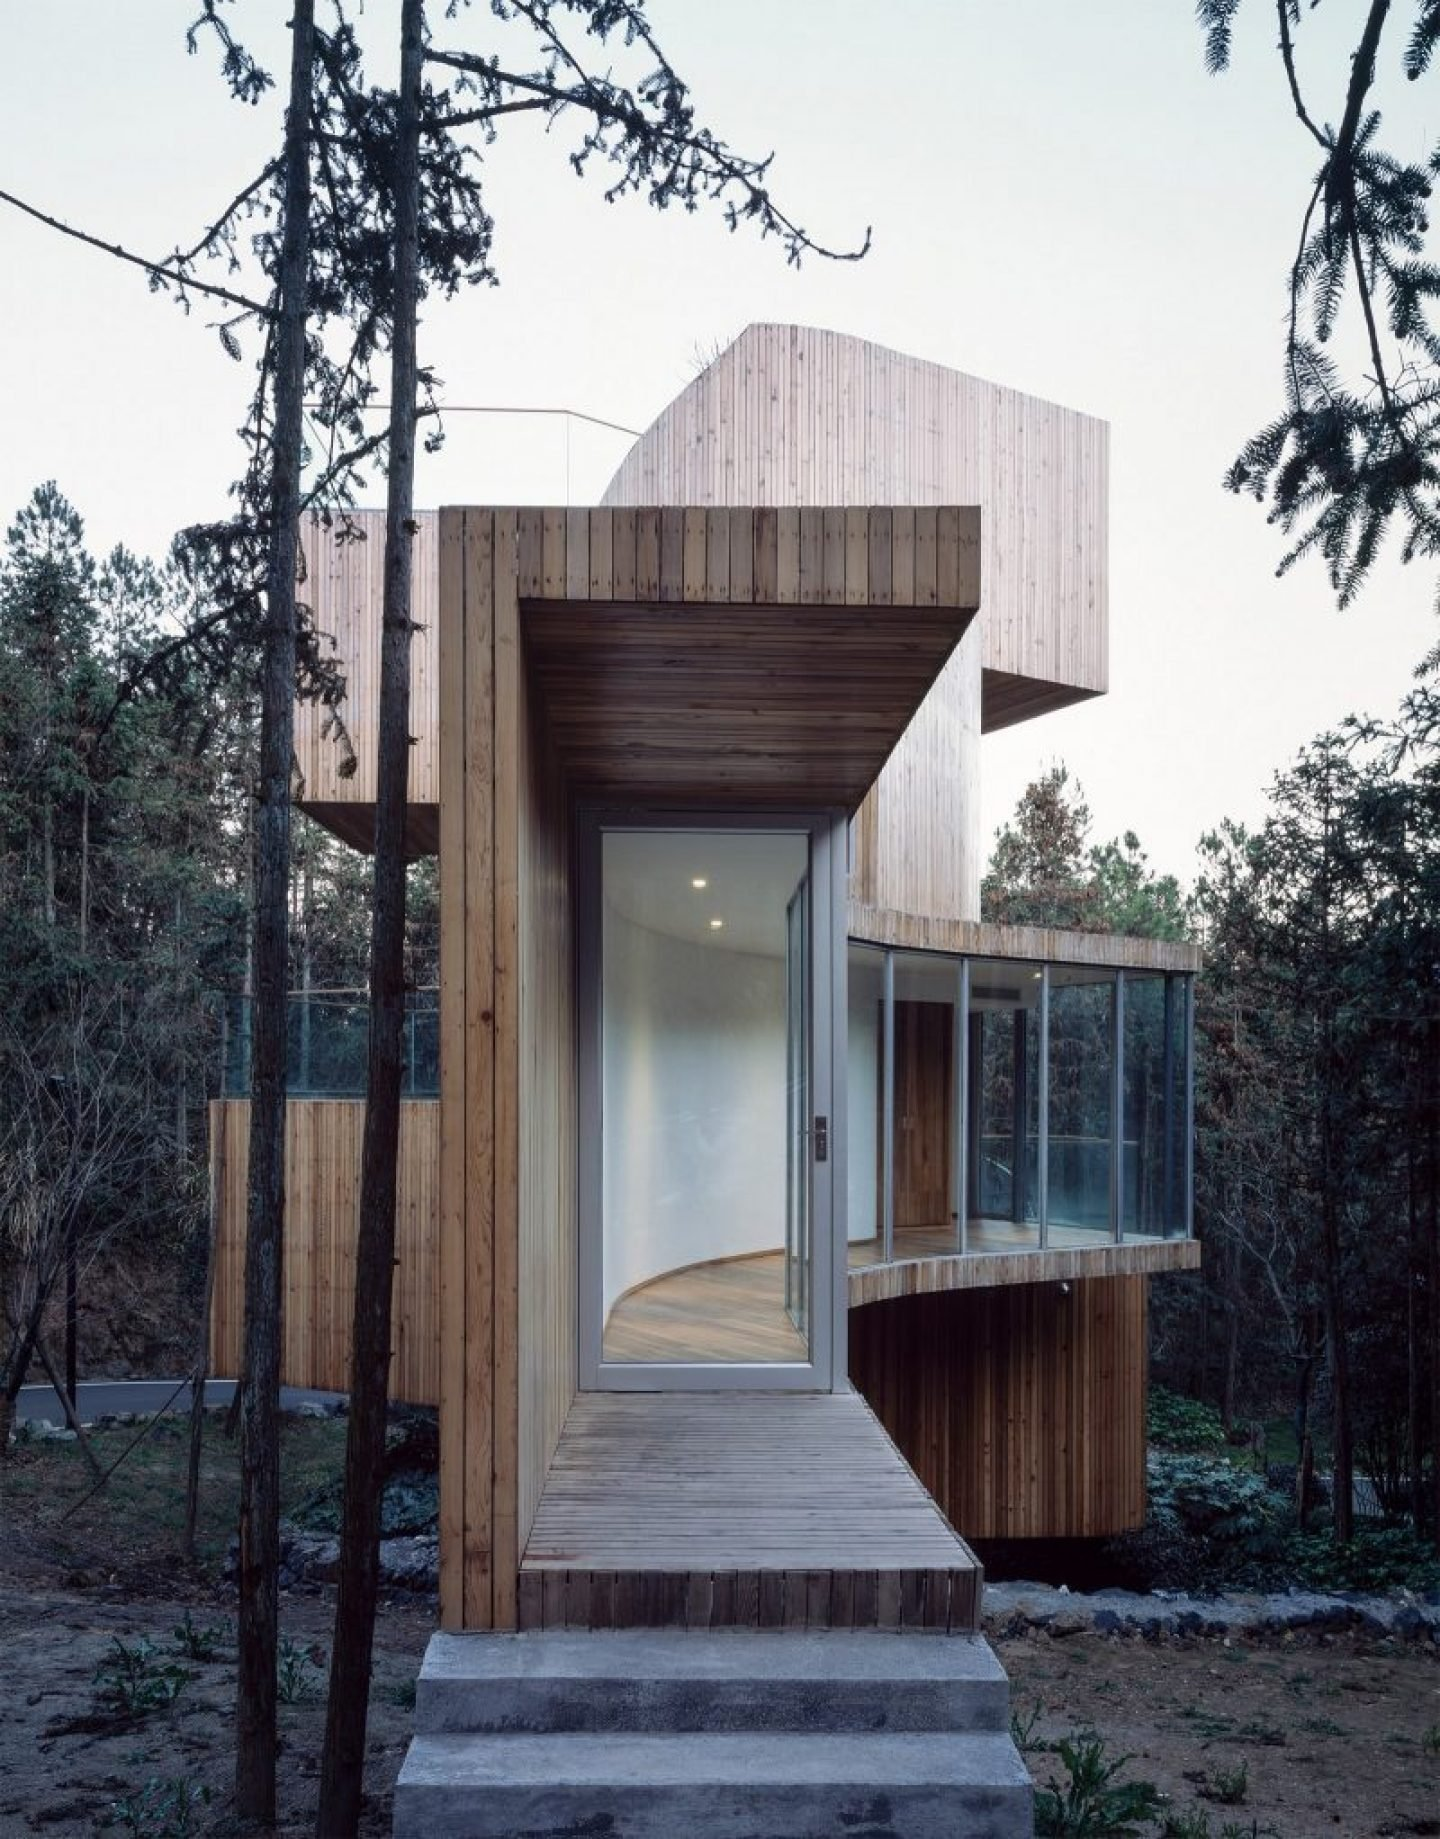 Bengo_Studio_Architecture (5)